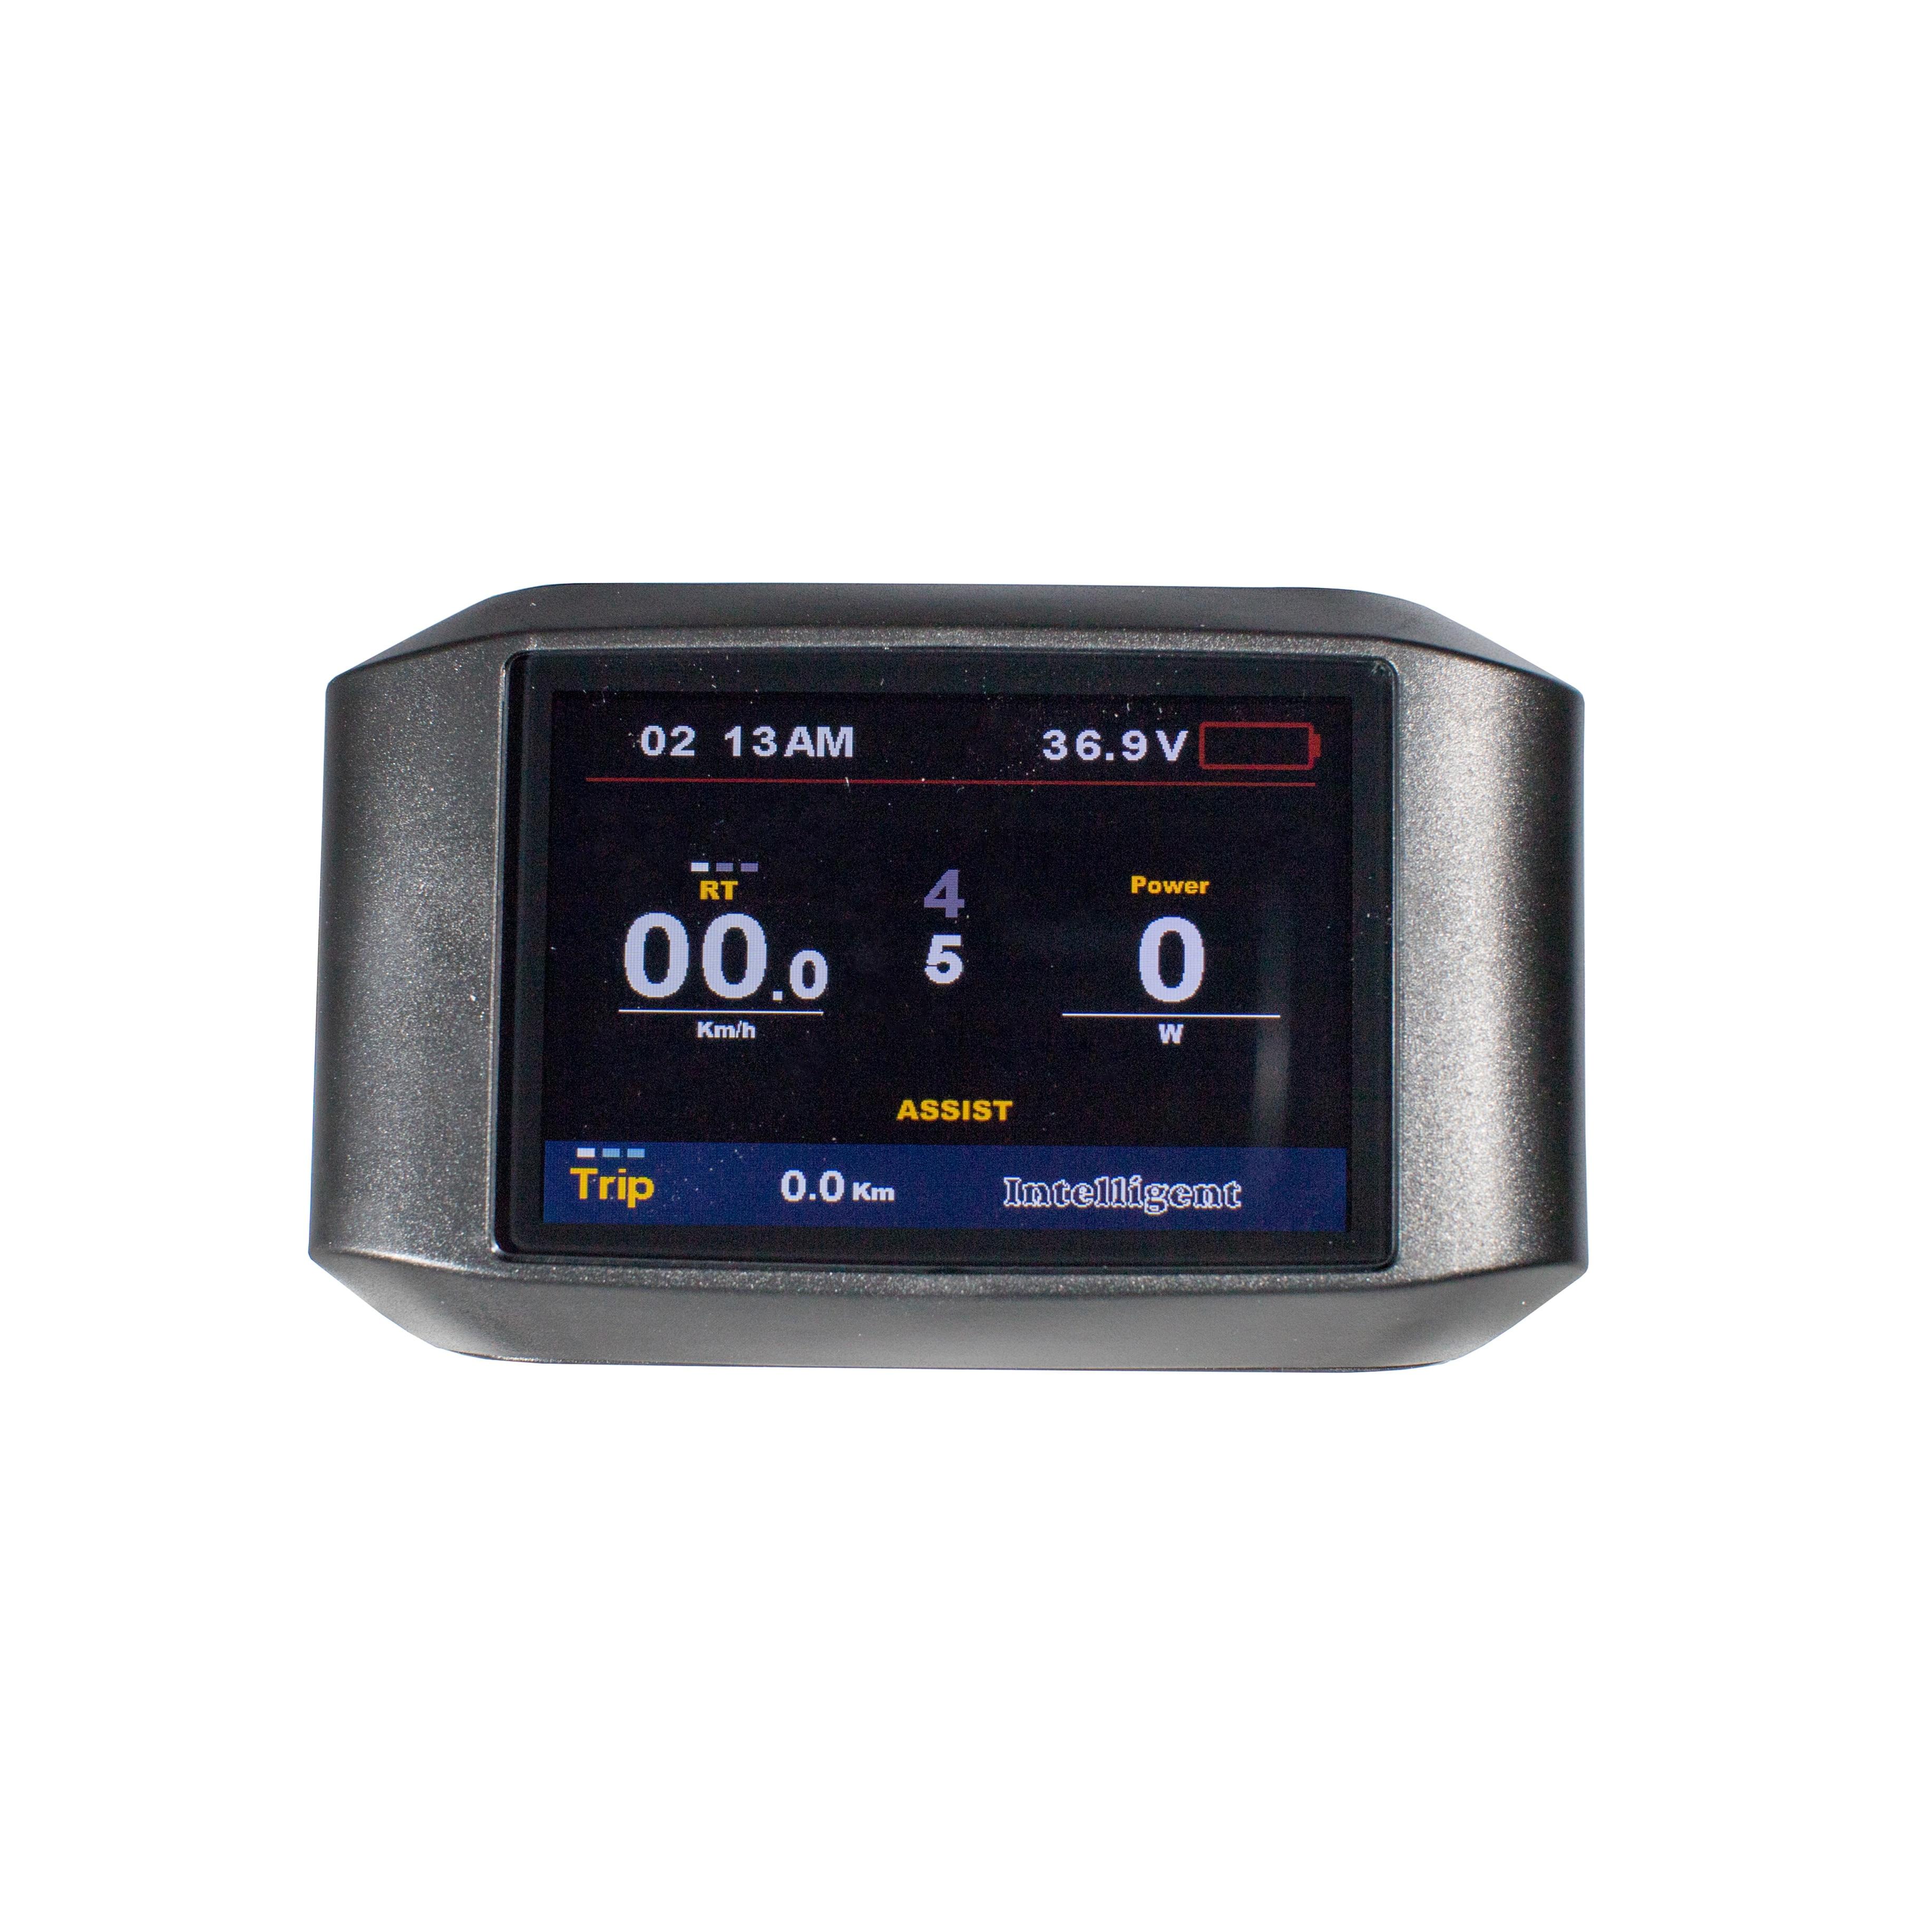 Greenpedel APT 750C TFT الاتصالات نقطة مصفوفة LCD دراجة كهربائية السلطة متر ل الدهون الاطارات دراجة كهربائية عدة